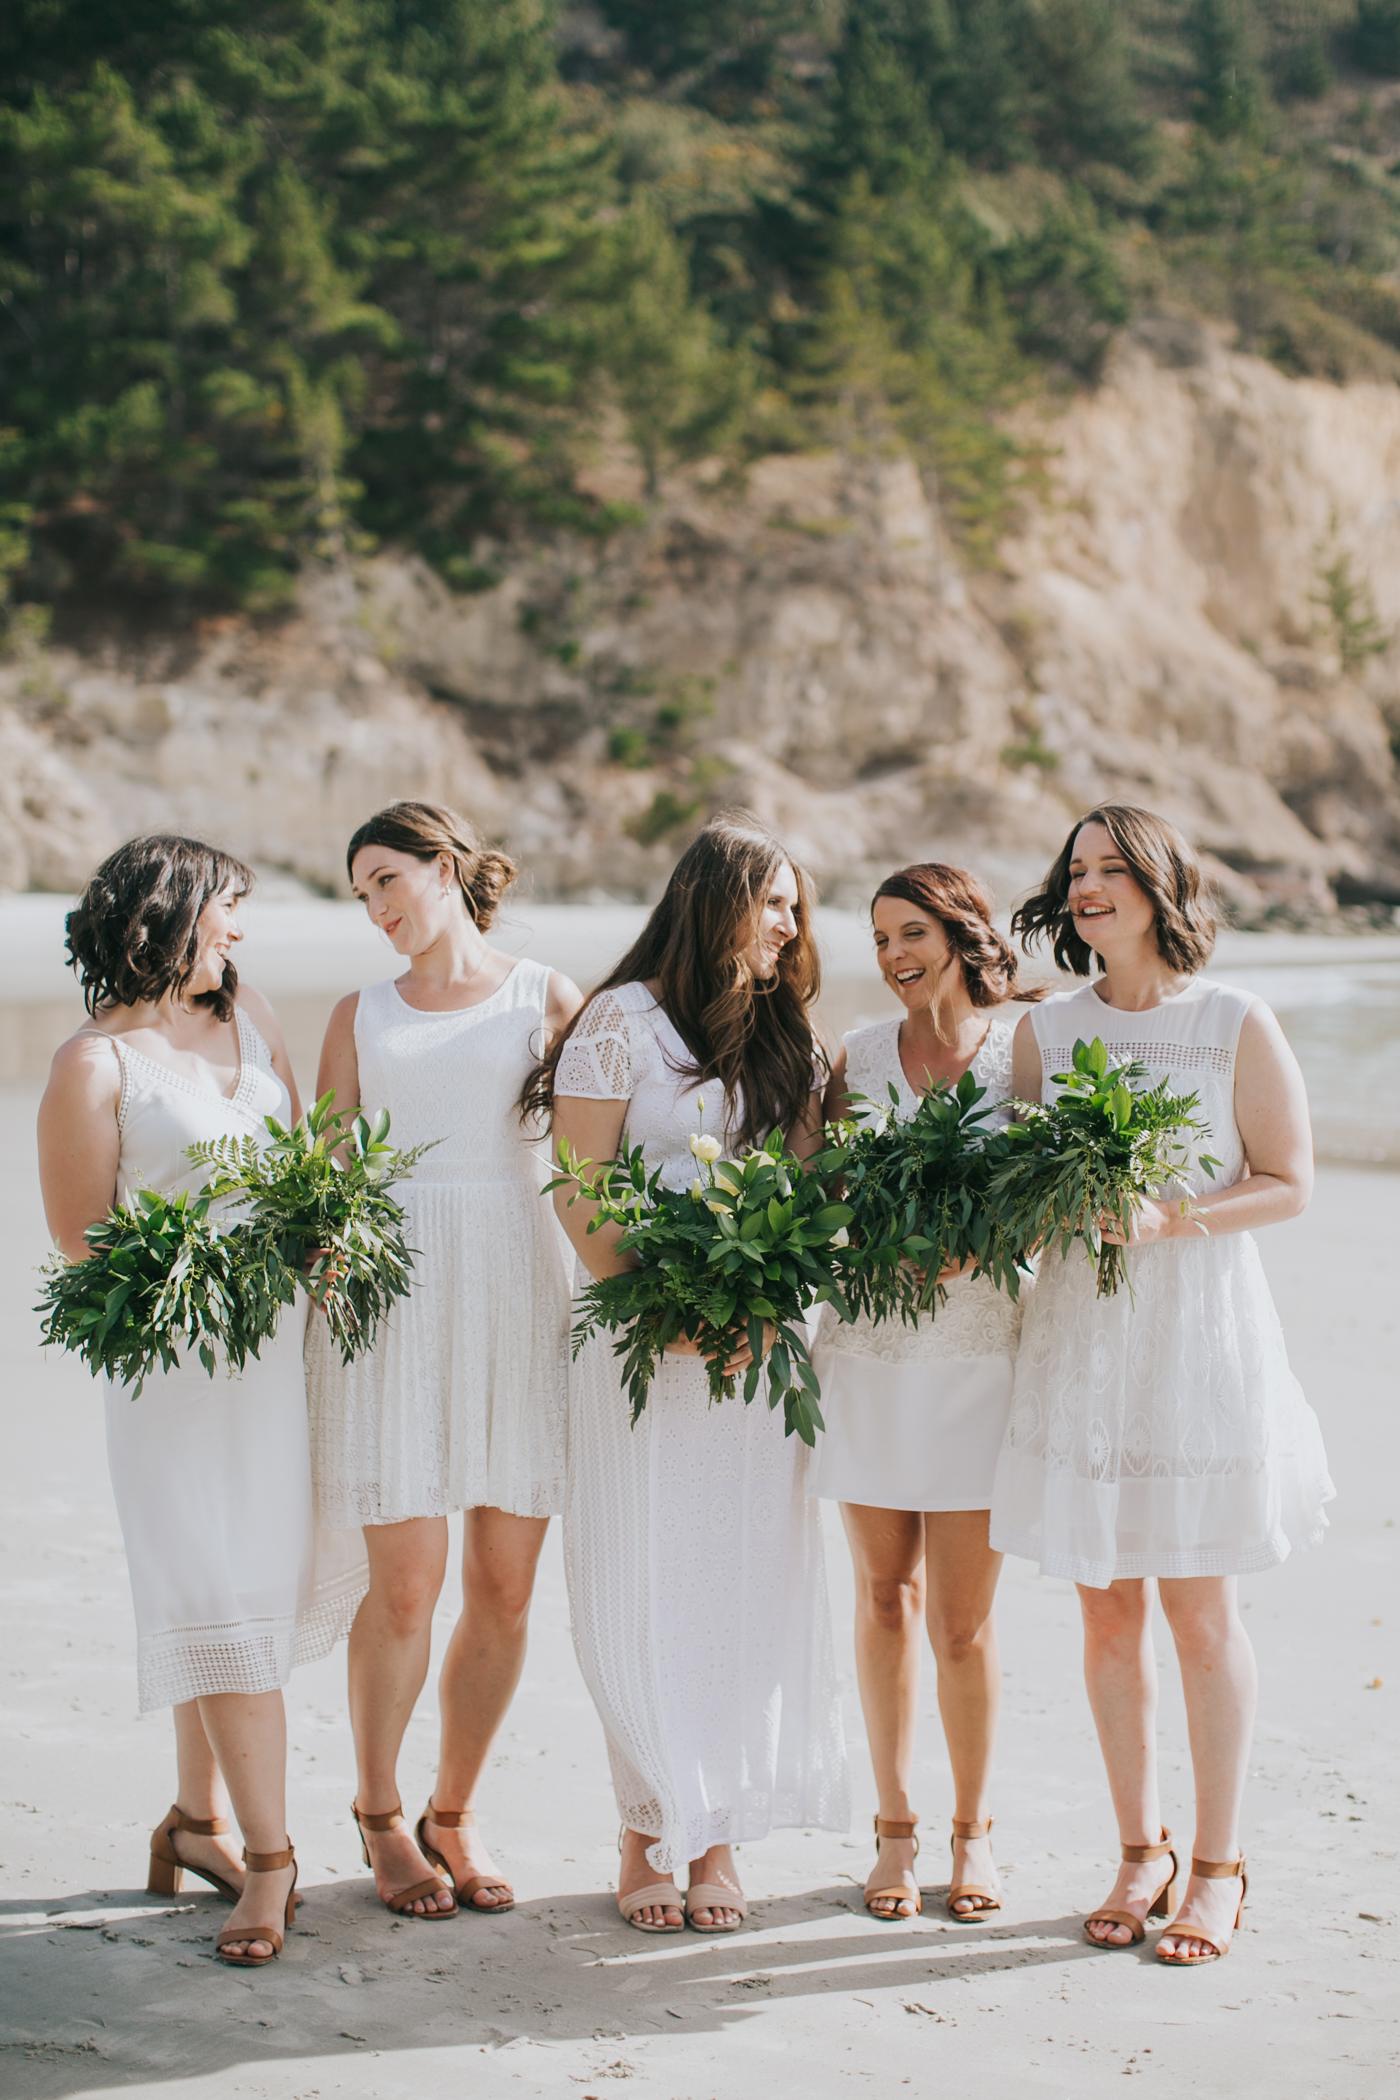 Ariana & Tim - Dunedin, New Zealand Wedding - Destination Wedding - Samantha Heather Photography-128.jpg